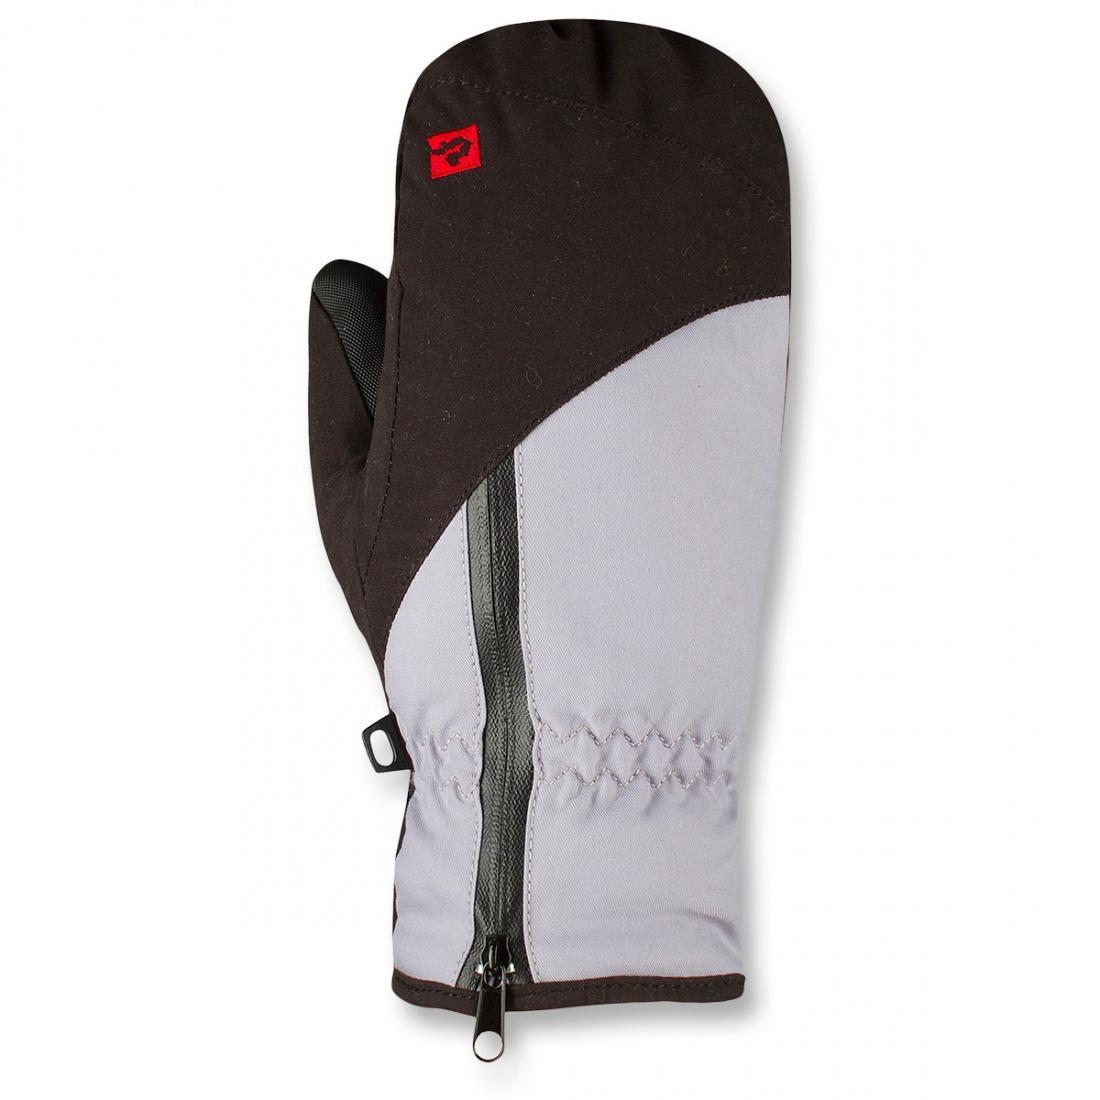 Рукавицы утепленные Traverse II ПодростковыеВарежки<br><br> Прогулочные утепленные рукавицы с ярким дизайном.<br><br><br><br><br><br>Материал – 50% Polyester, 50% Nylon, 156 g/sqm.<br>Усиление – 80% Polyvinyl Chloride, 20% Polyester, 690 g/sqm.<br>Утеплитель – Omnitherm® Classic...<br><br>Цвет: Серый<br>Размер: XL